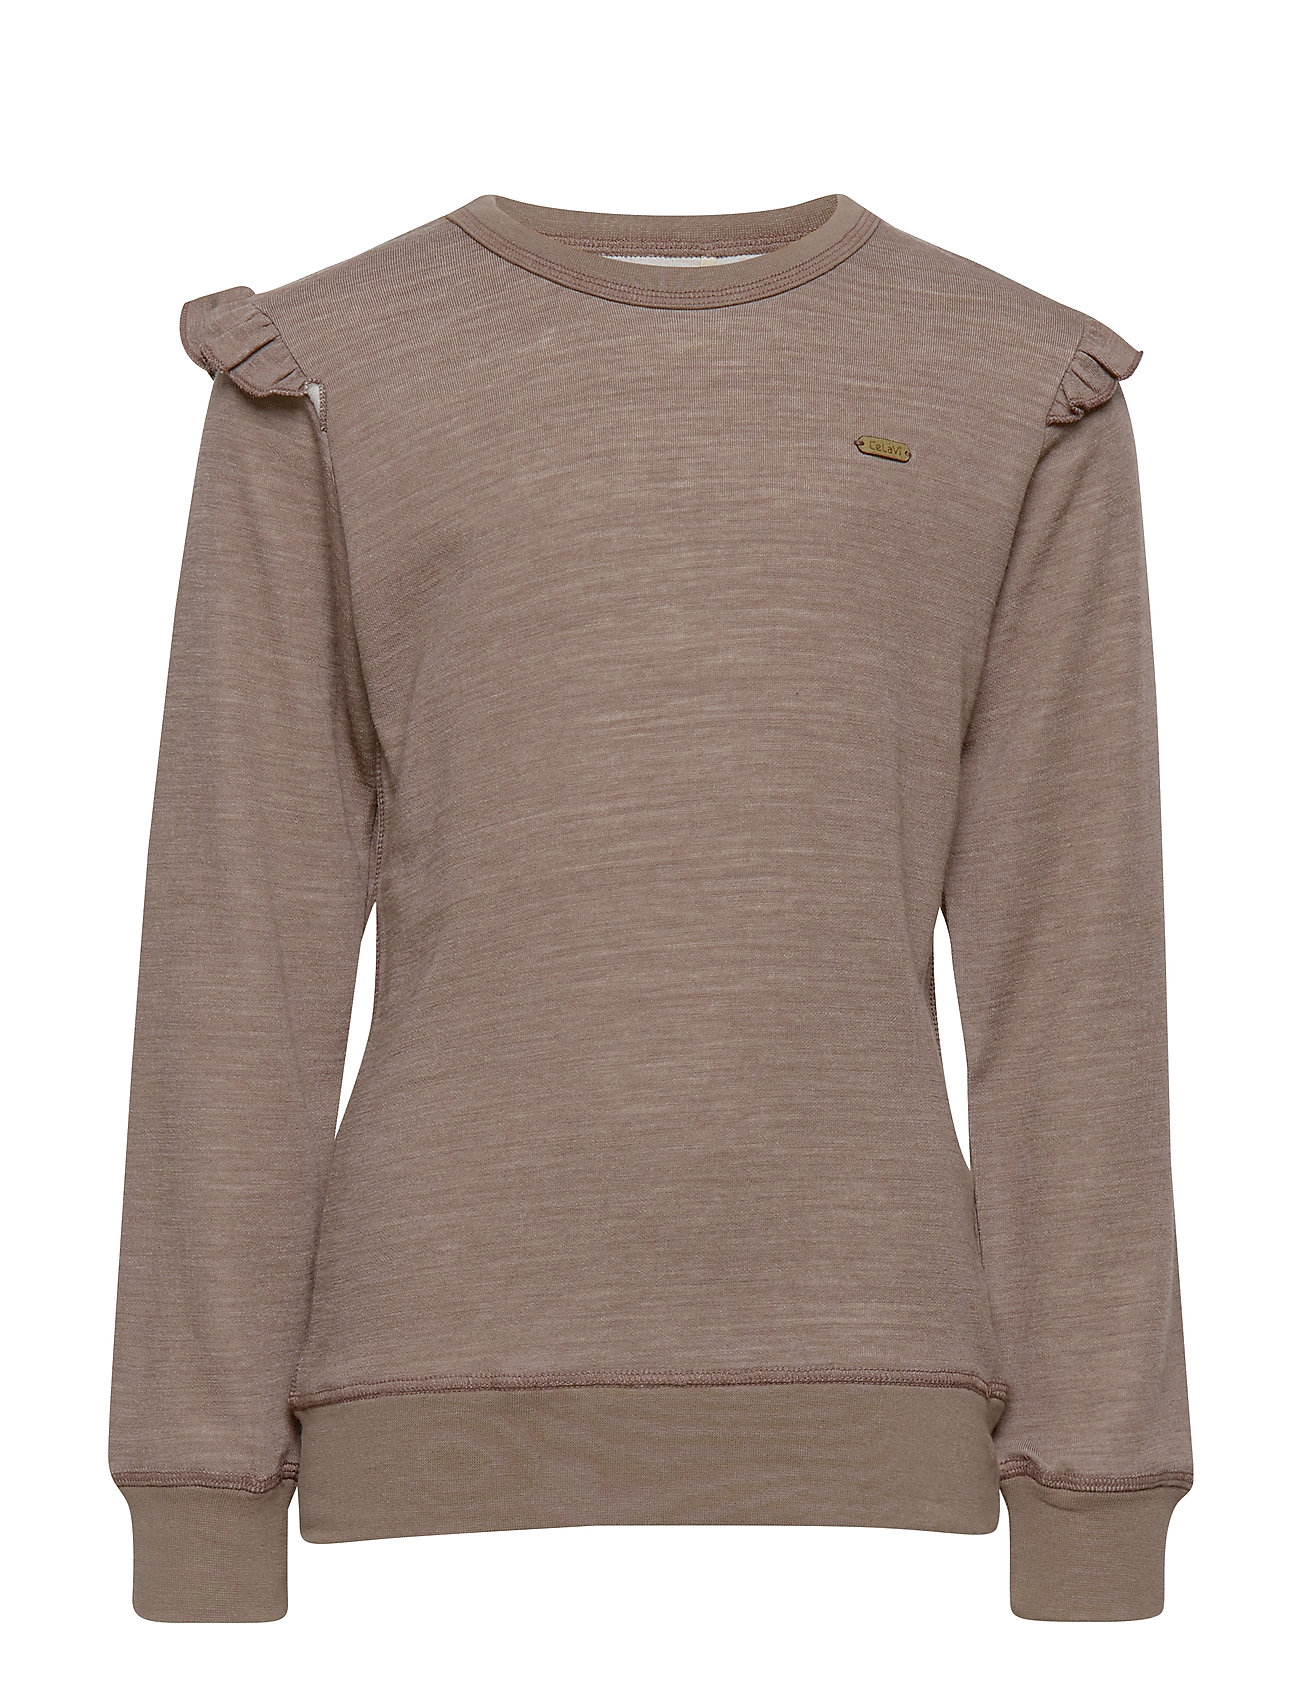 CeLaVi Sweatshirt LS, Solid, Melange - ACRE